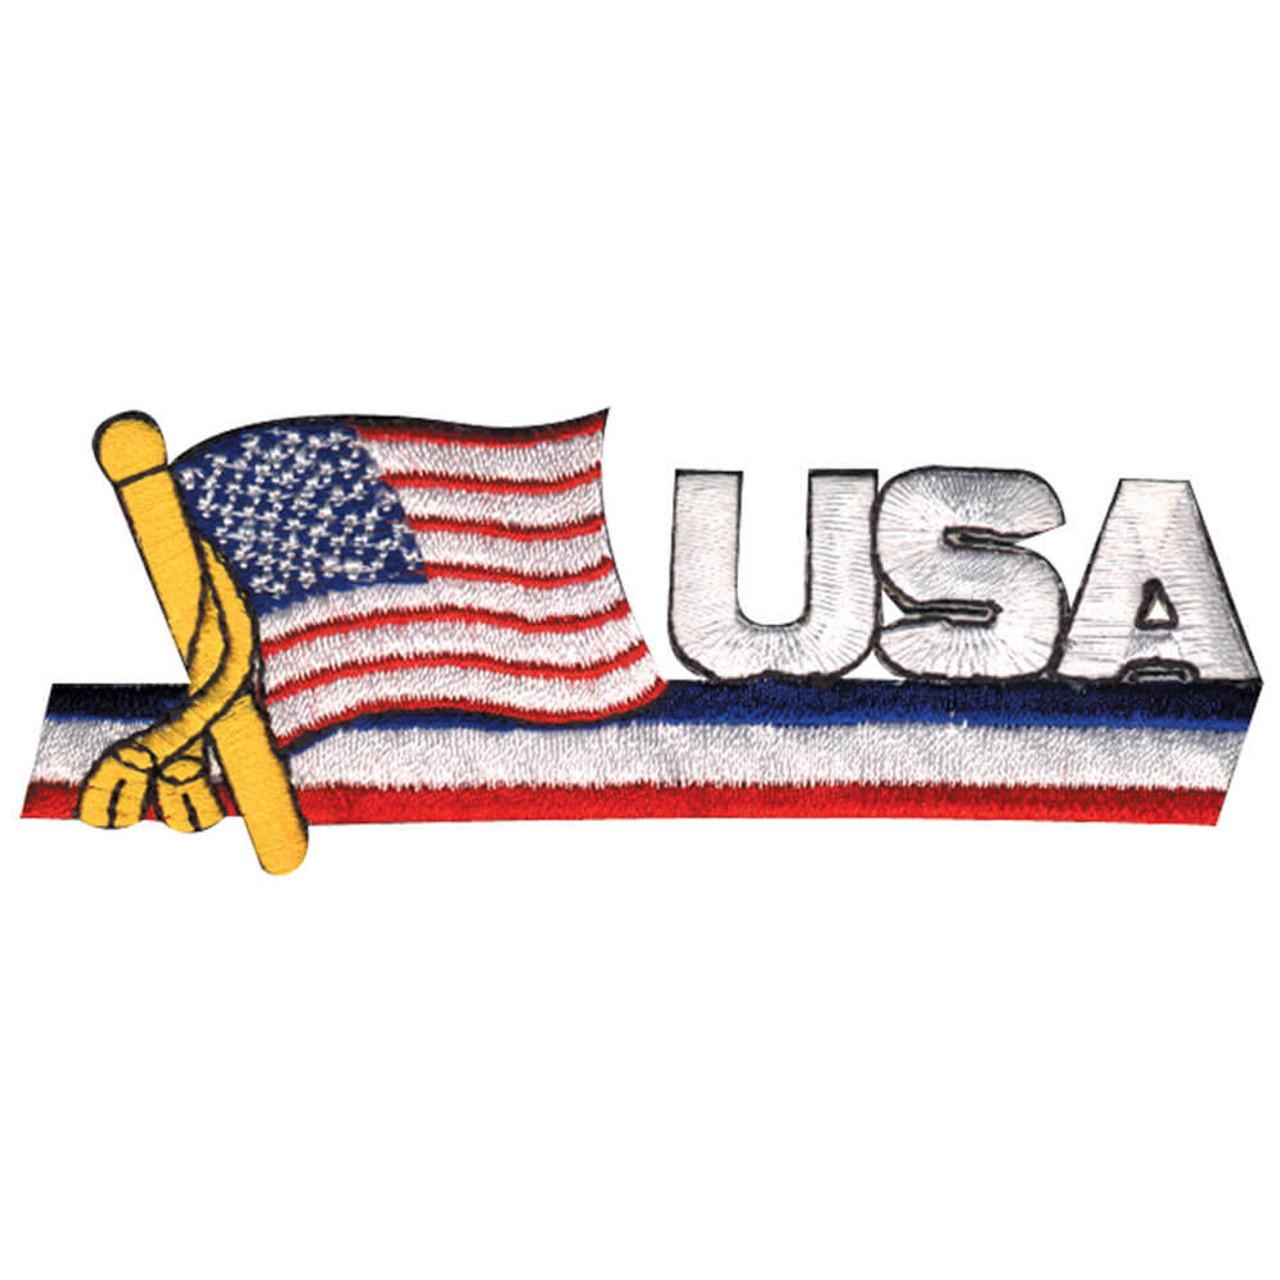 USA Patch With Flag & Pole